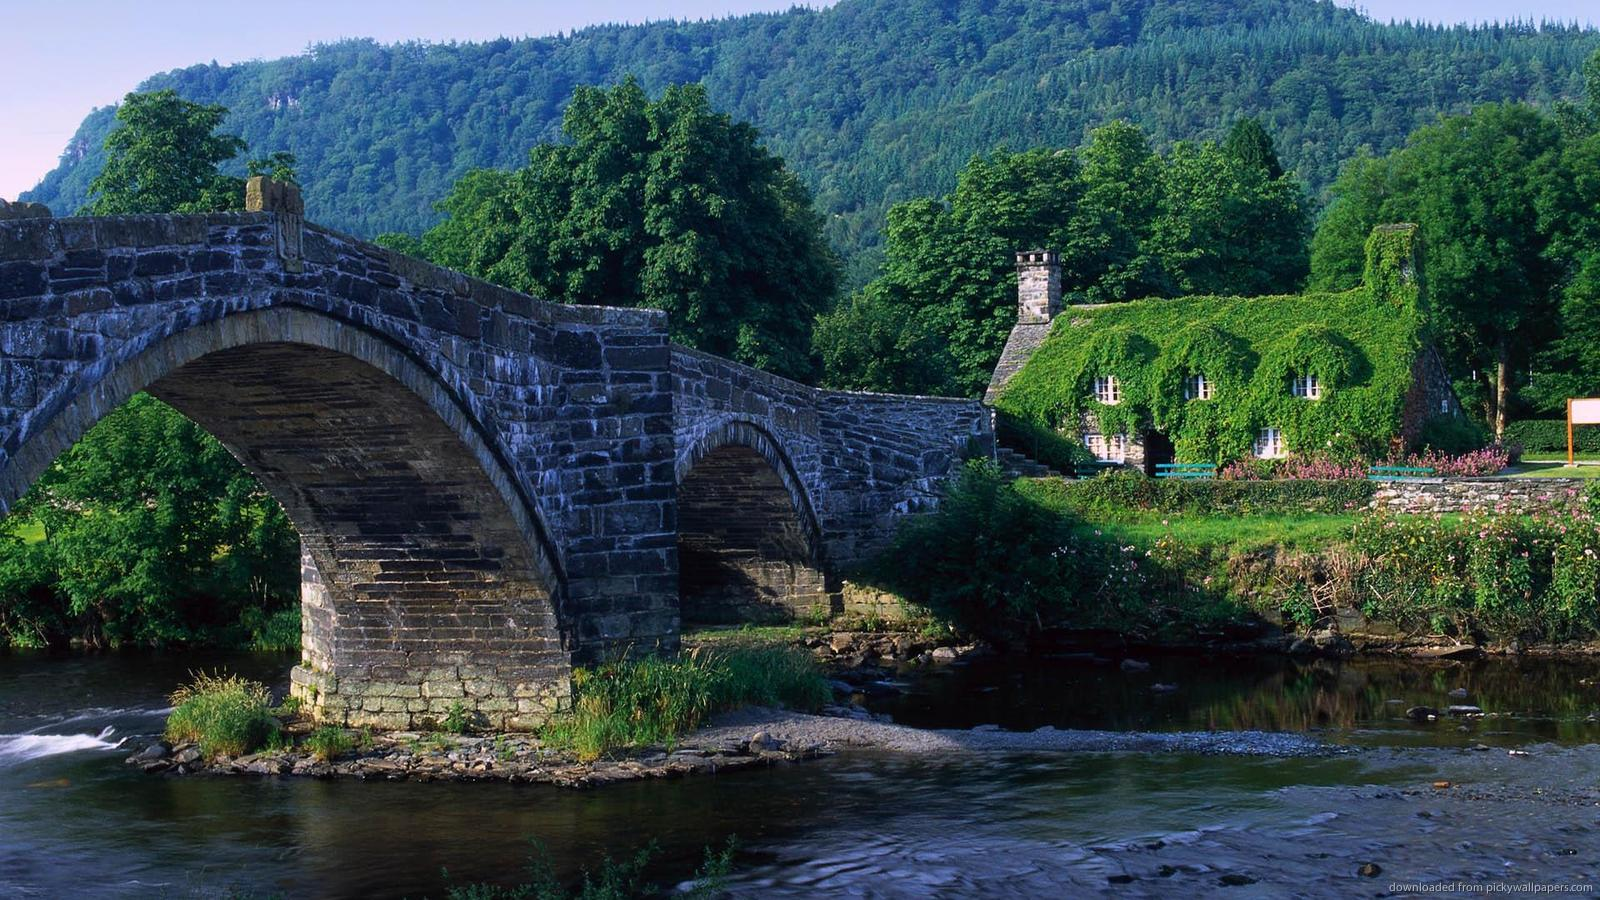 Download 1600x900 Arch Bridge Wales UK Wallpaper 1600x900